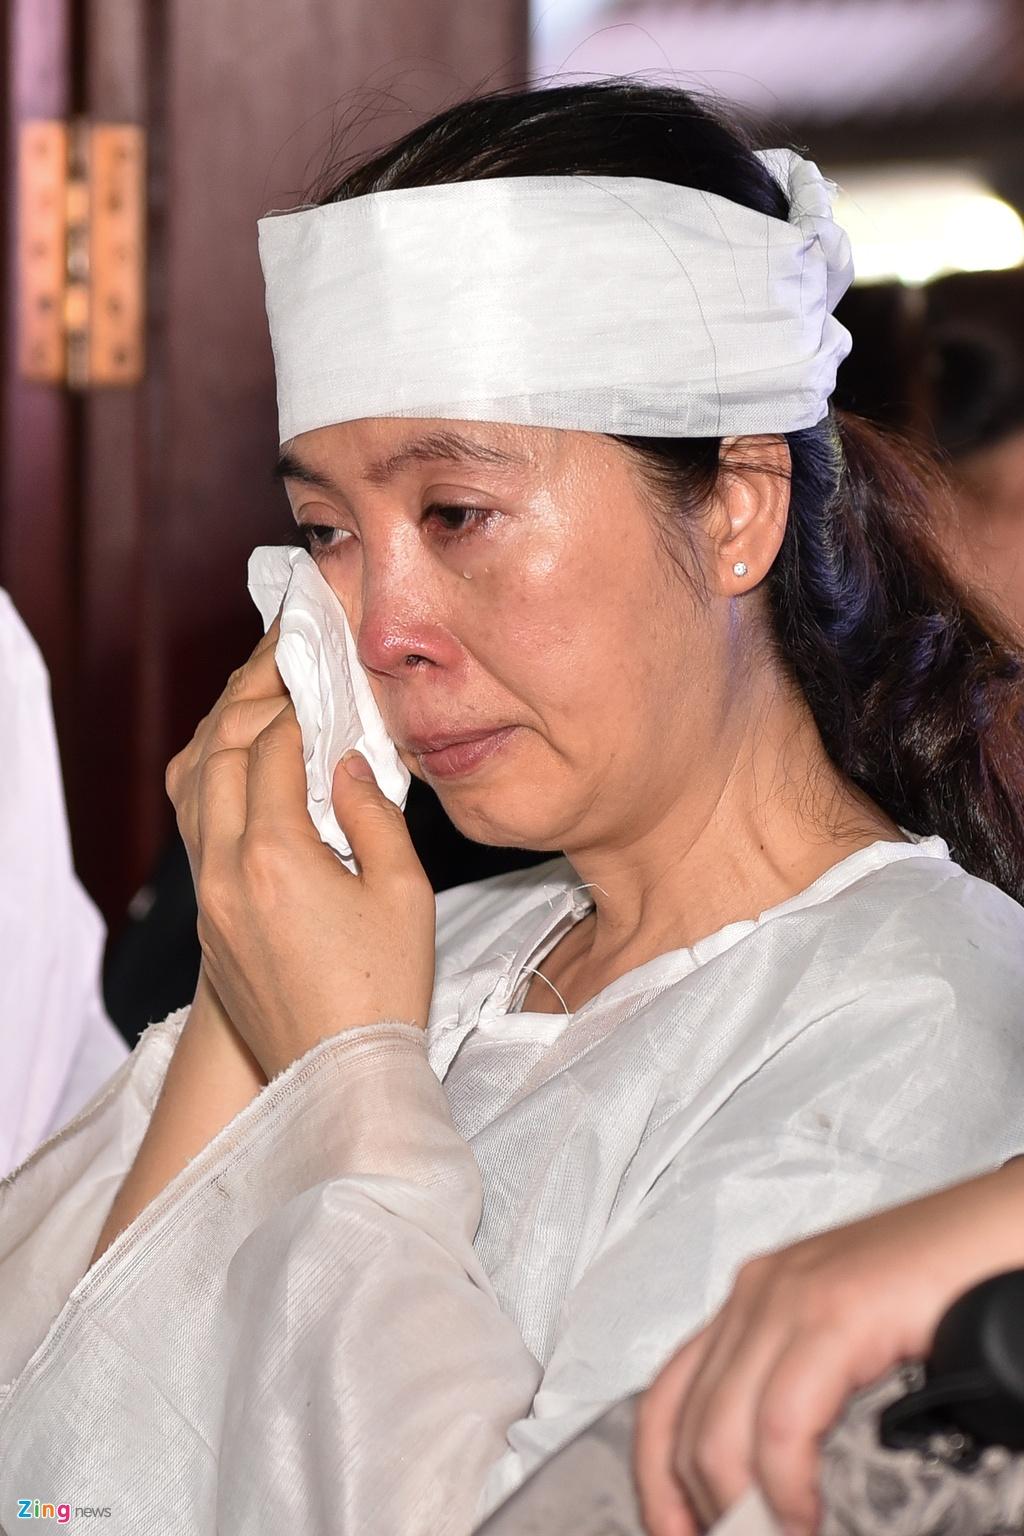 Nghe si mien Nam dua tien dien vien hai Manh Trang hinh anh 7